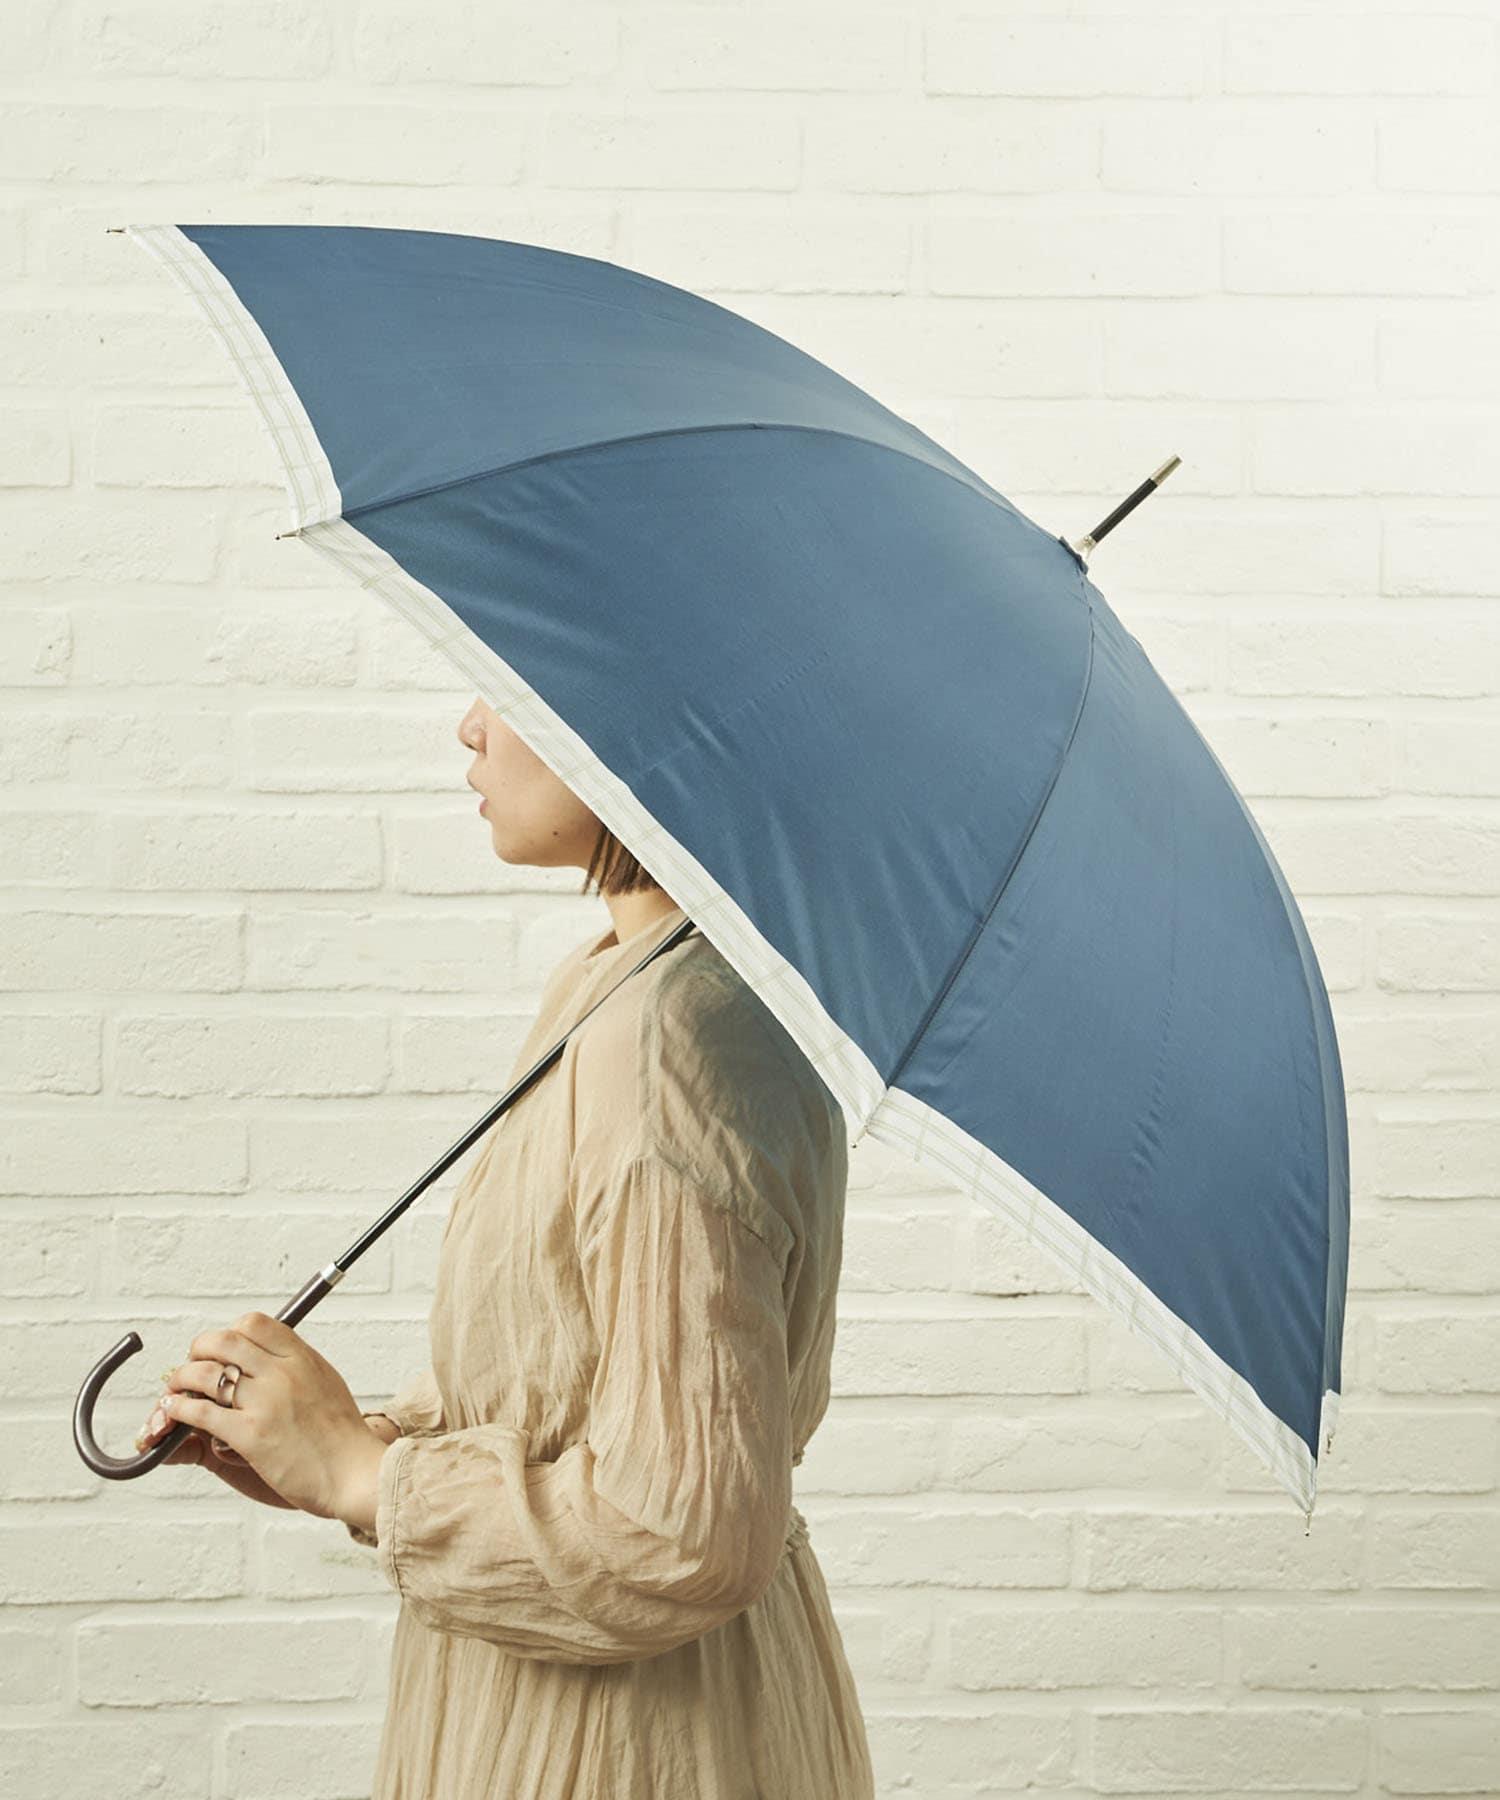 salut!(サリュ) ライフスタイル 雨傘長裾チェック(ネイビー) その他